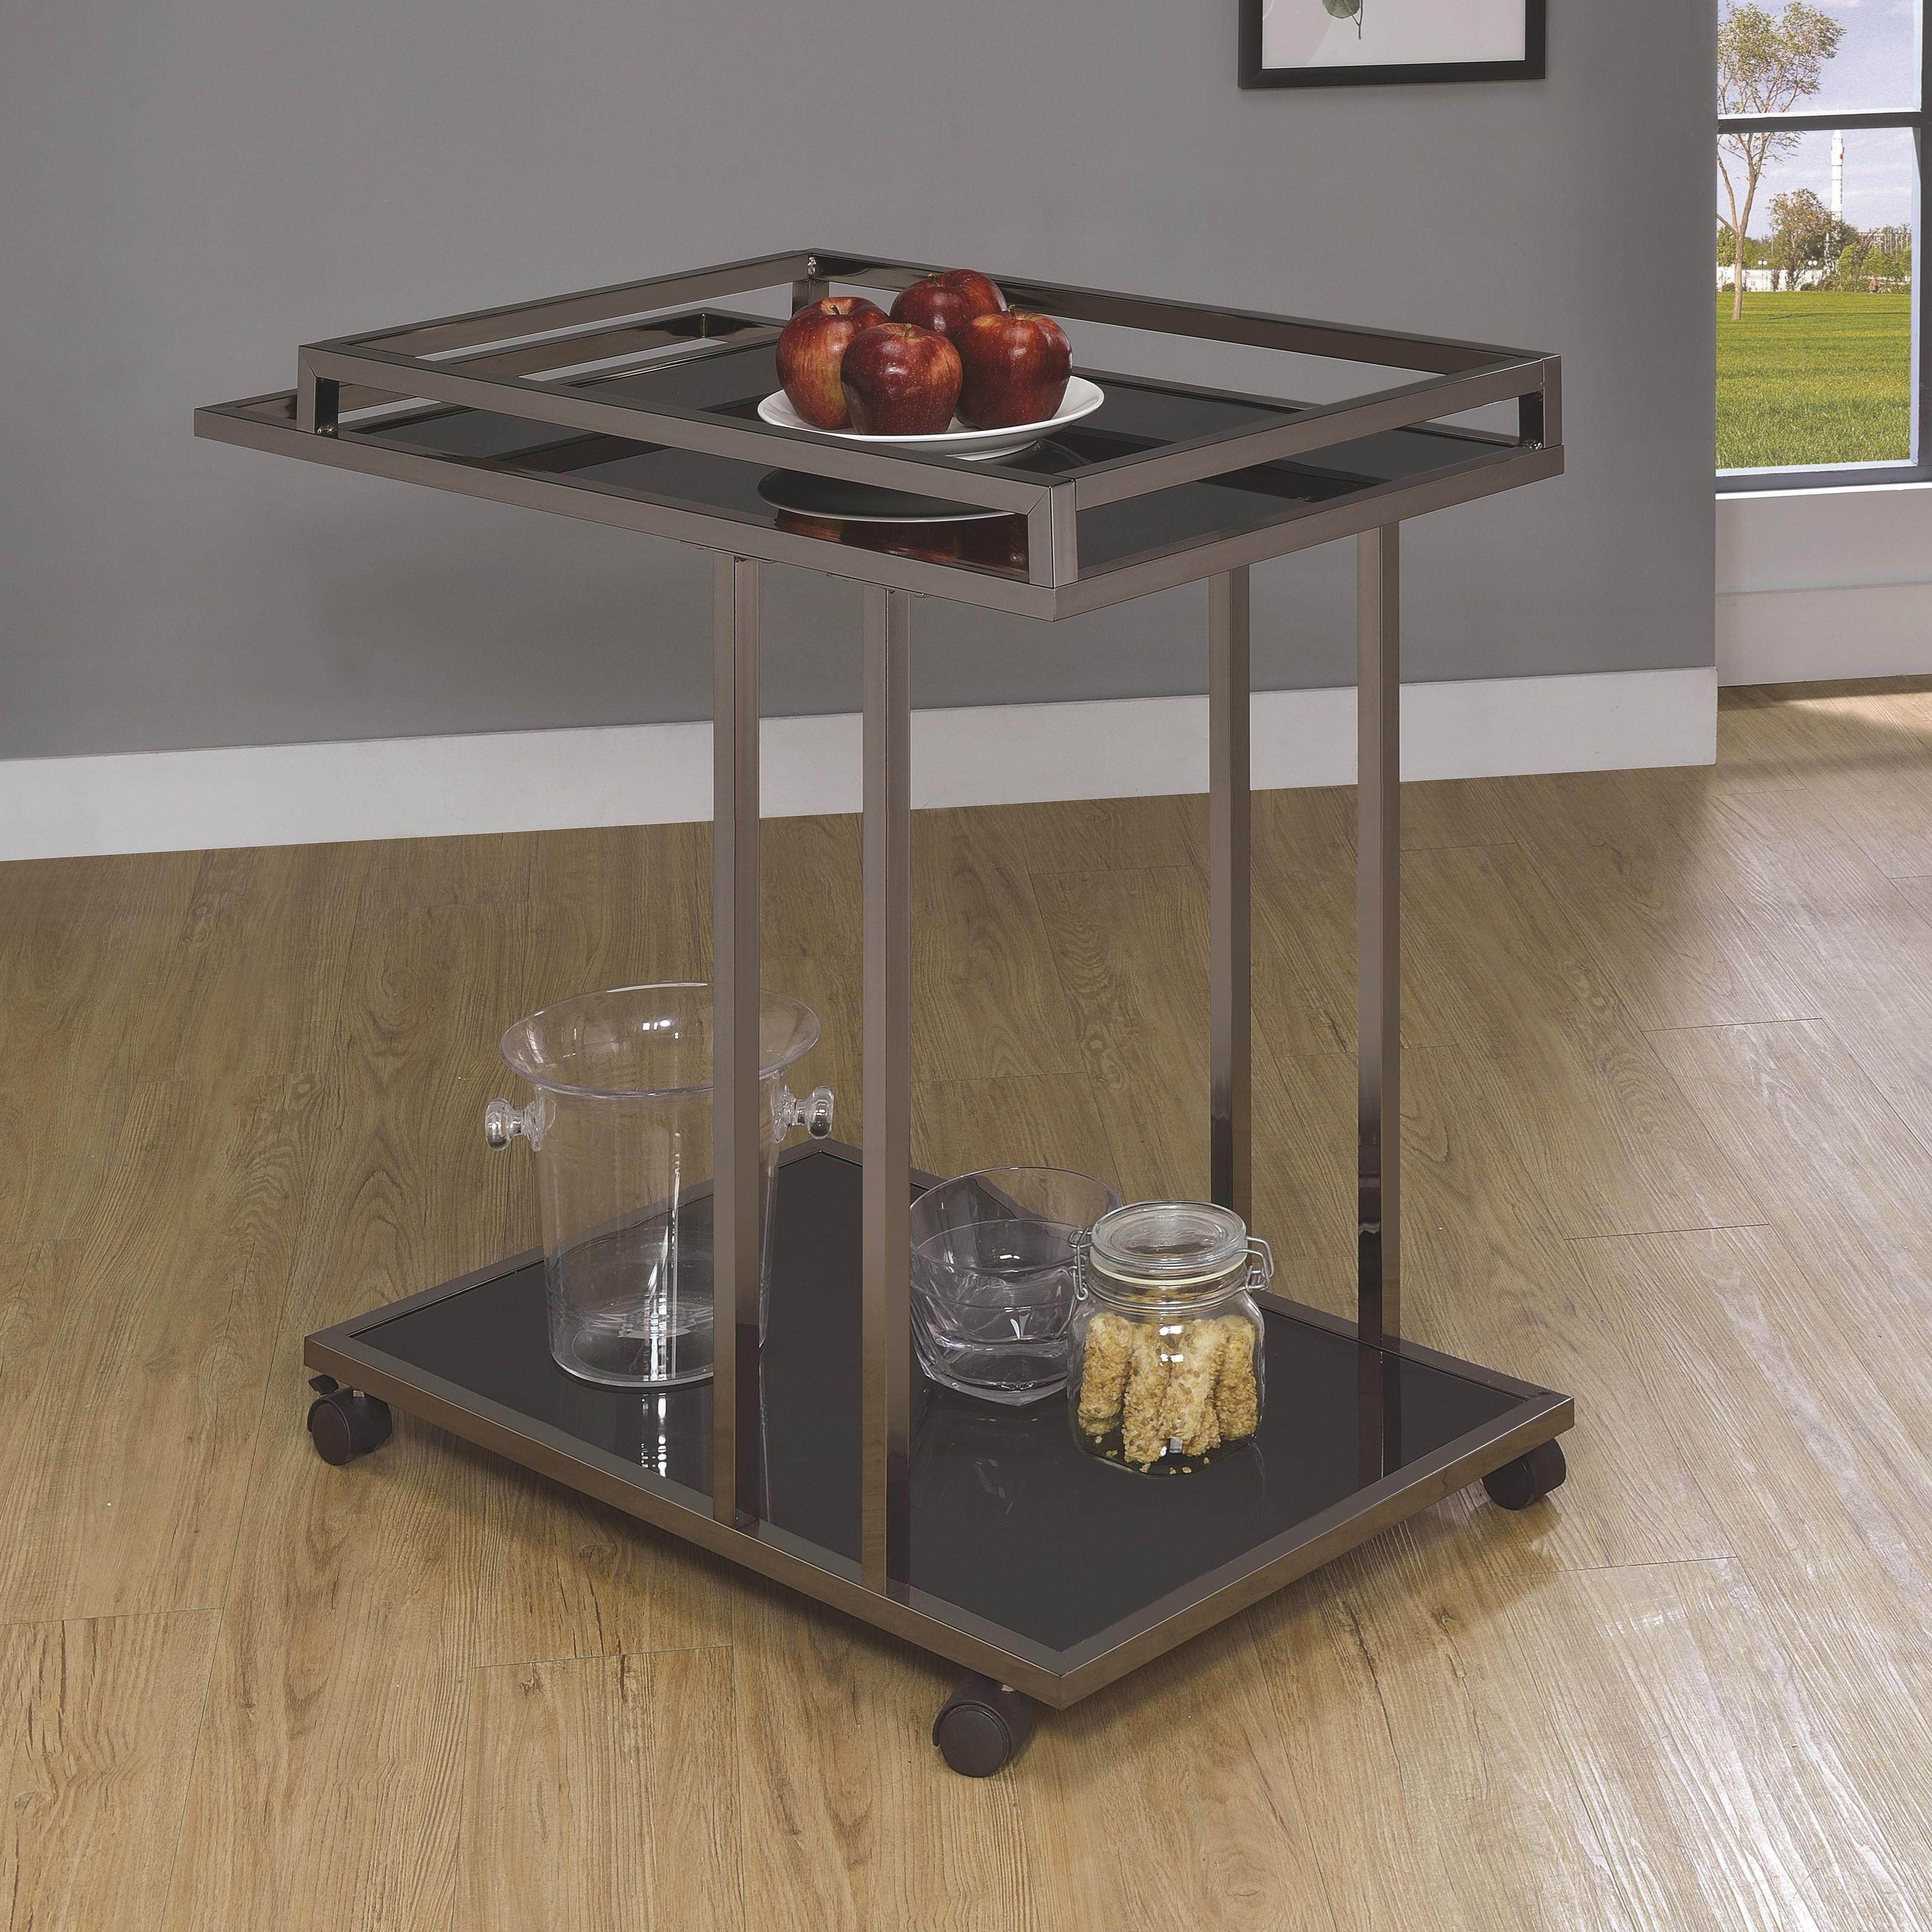 Kitchen Carts Serving Cart by Coaster at Lapeer Furniture & Mattress Center